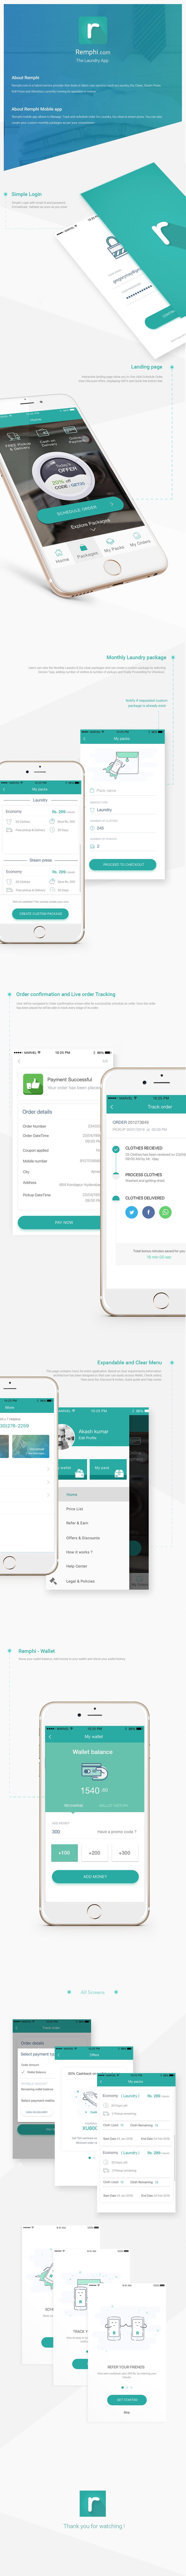 "Check out this @Behance project: ""Remphi.com | The Laundry App - Mobile app design"" https://www.behance.net/gallery/46398291/Remphicom-The-Laundry-App-Mobile-app-design"